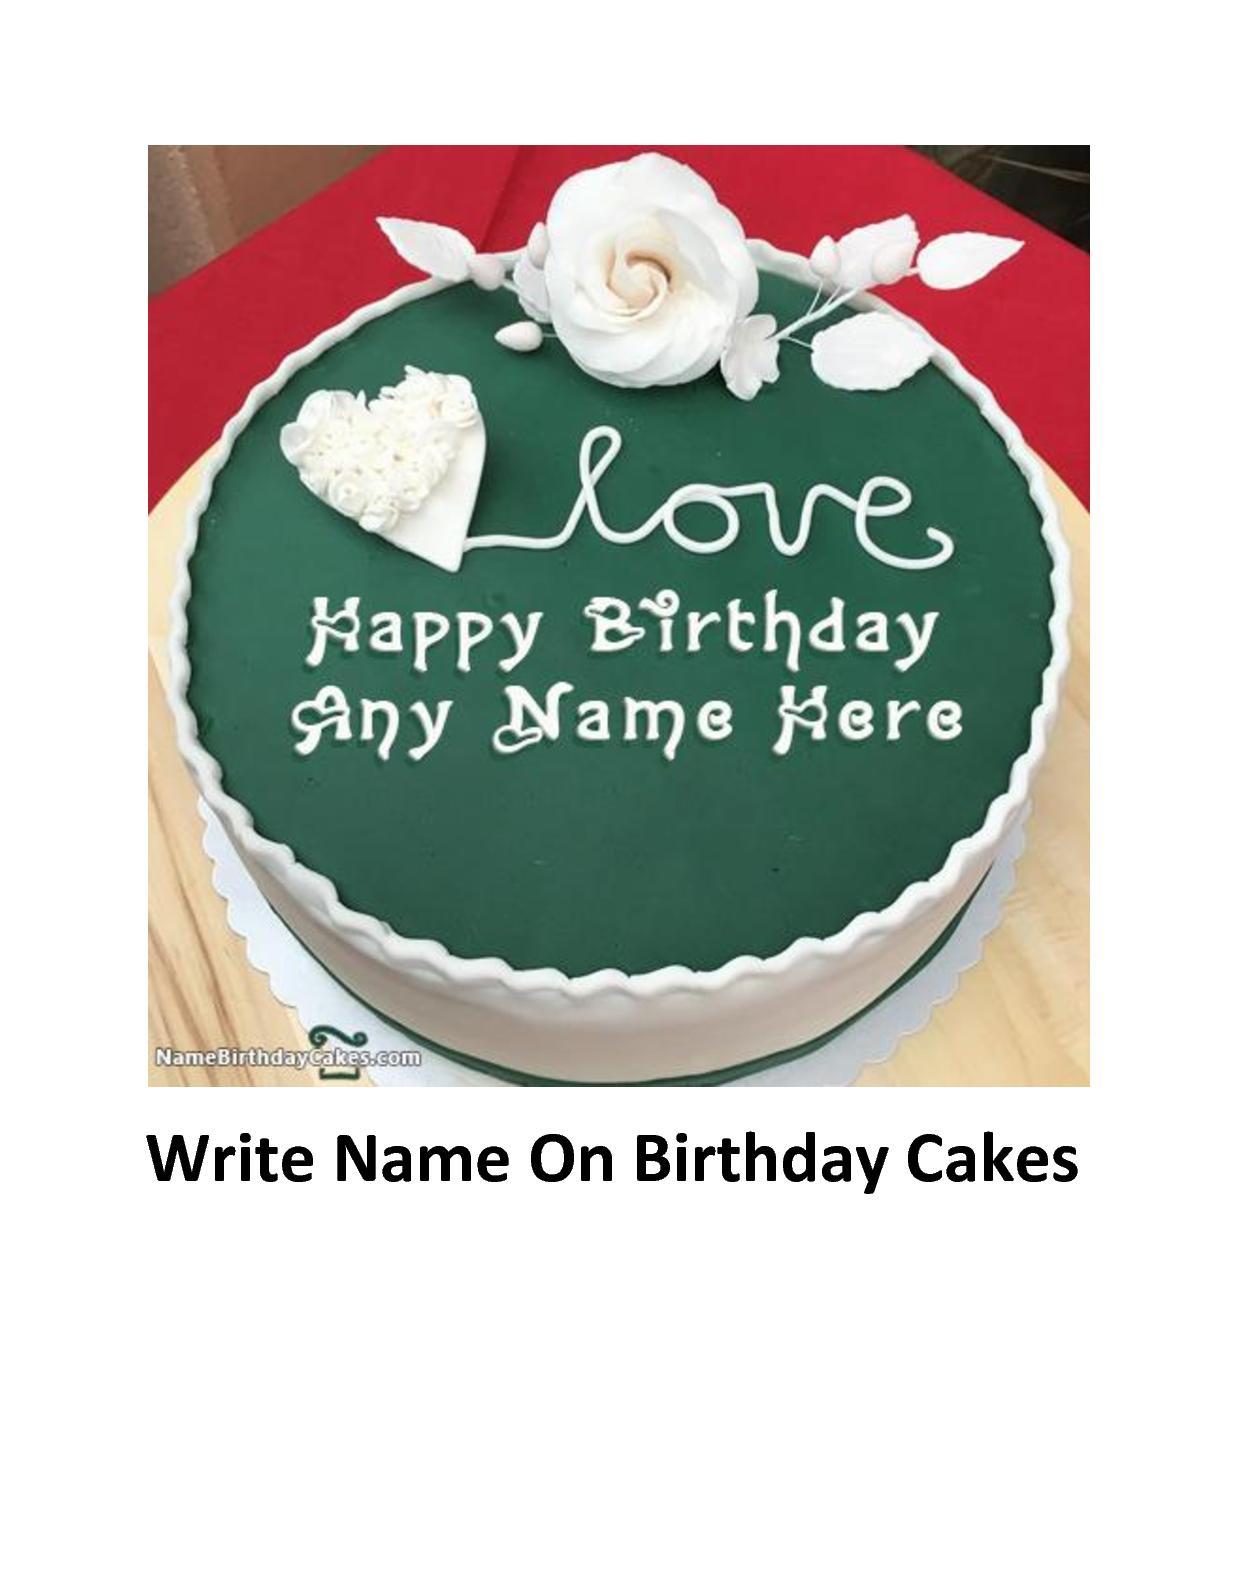 Astonishing Calameo Create Virtual Birthday Greetings With Name Funny Birthday Cards Online Barepcheapnameinfo